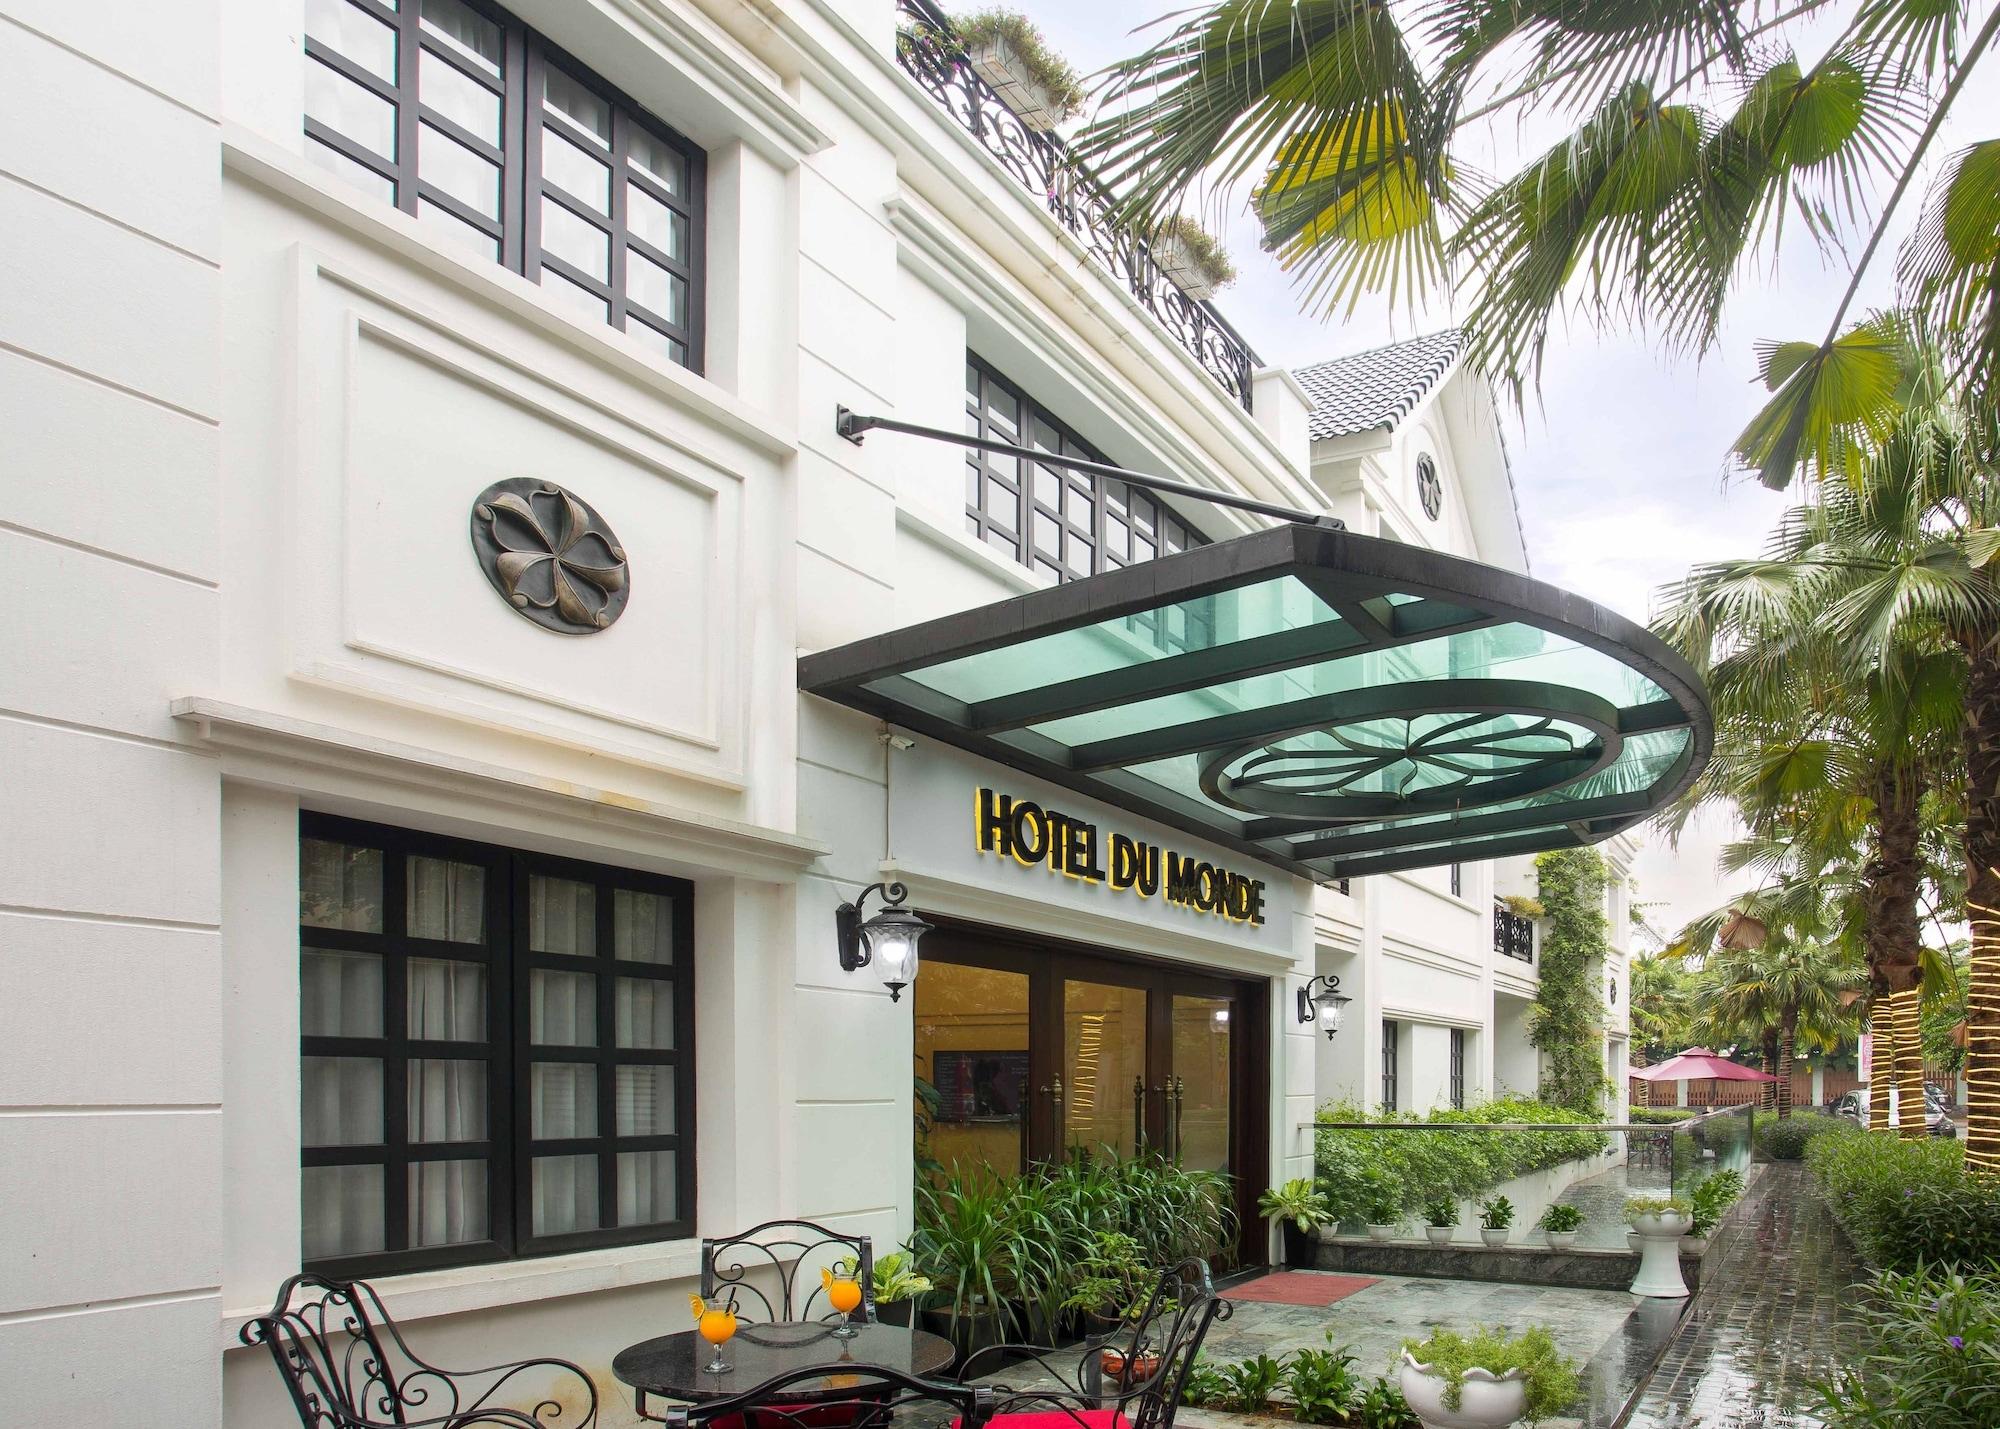 Hotel du Monde, Long Biên